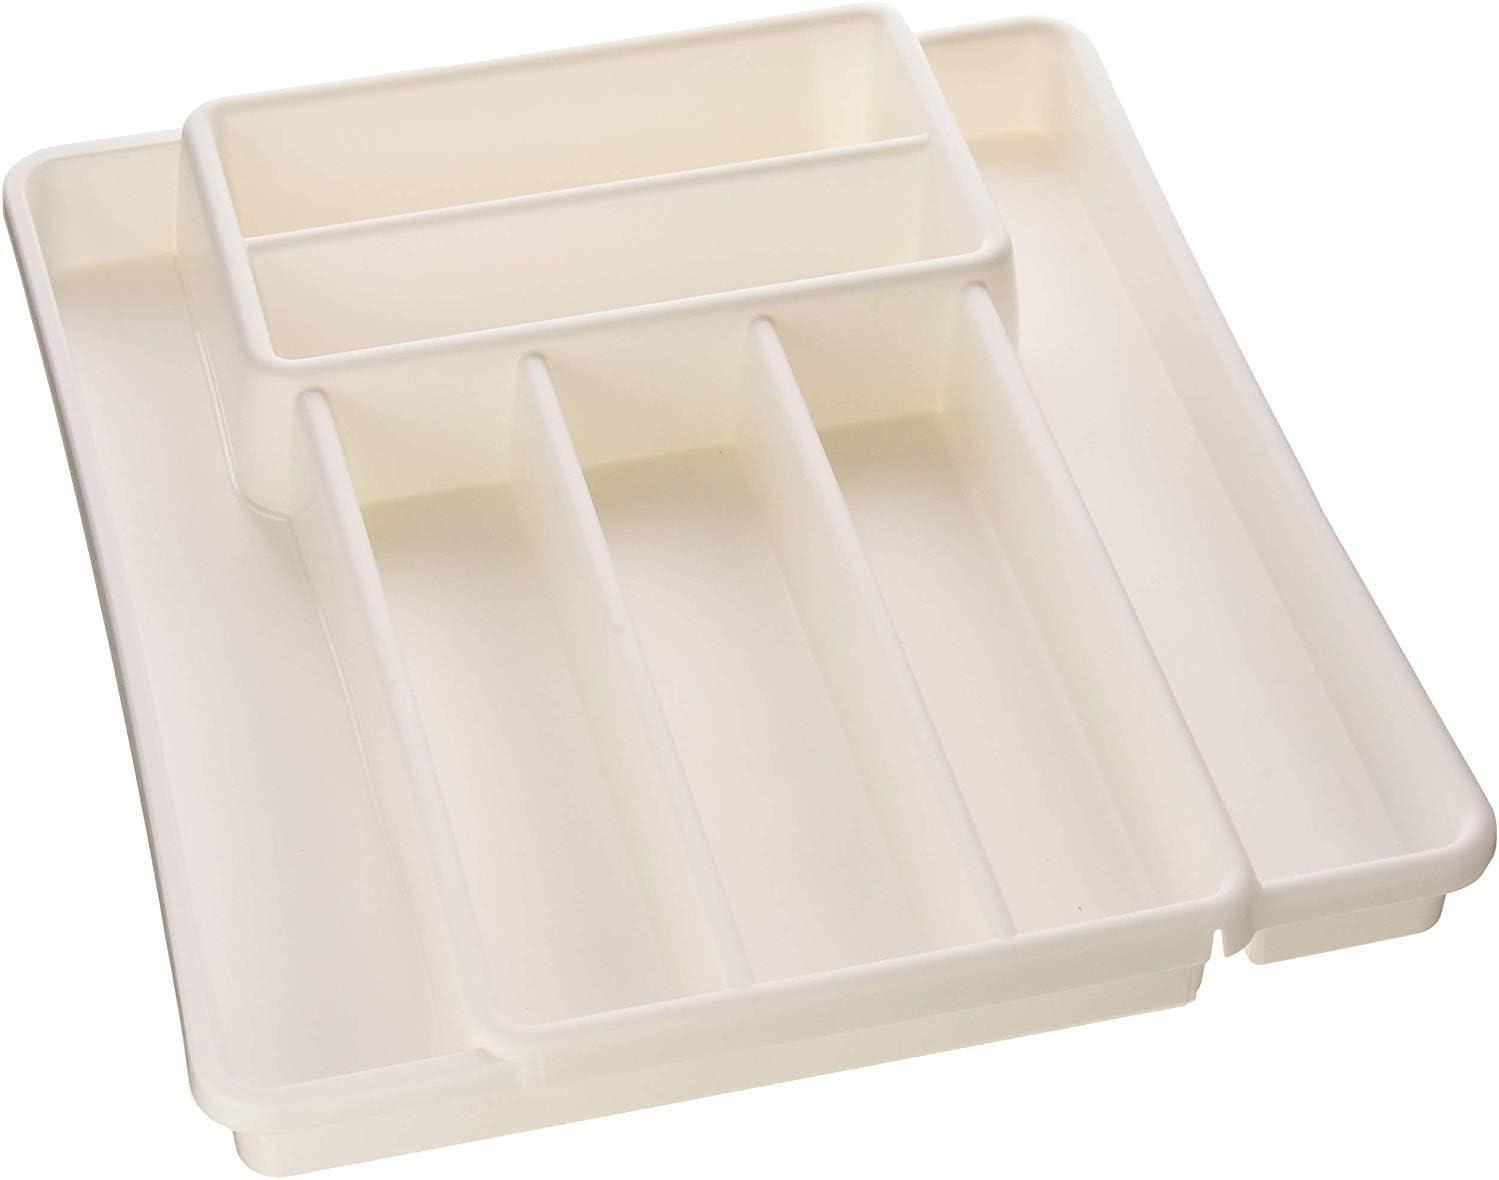 Rotho Range COUV.Extensible Blanc Besteckkasten 39,7 x 34 x 5 cm